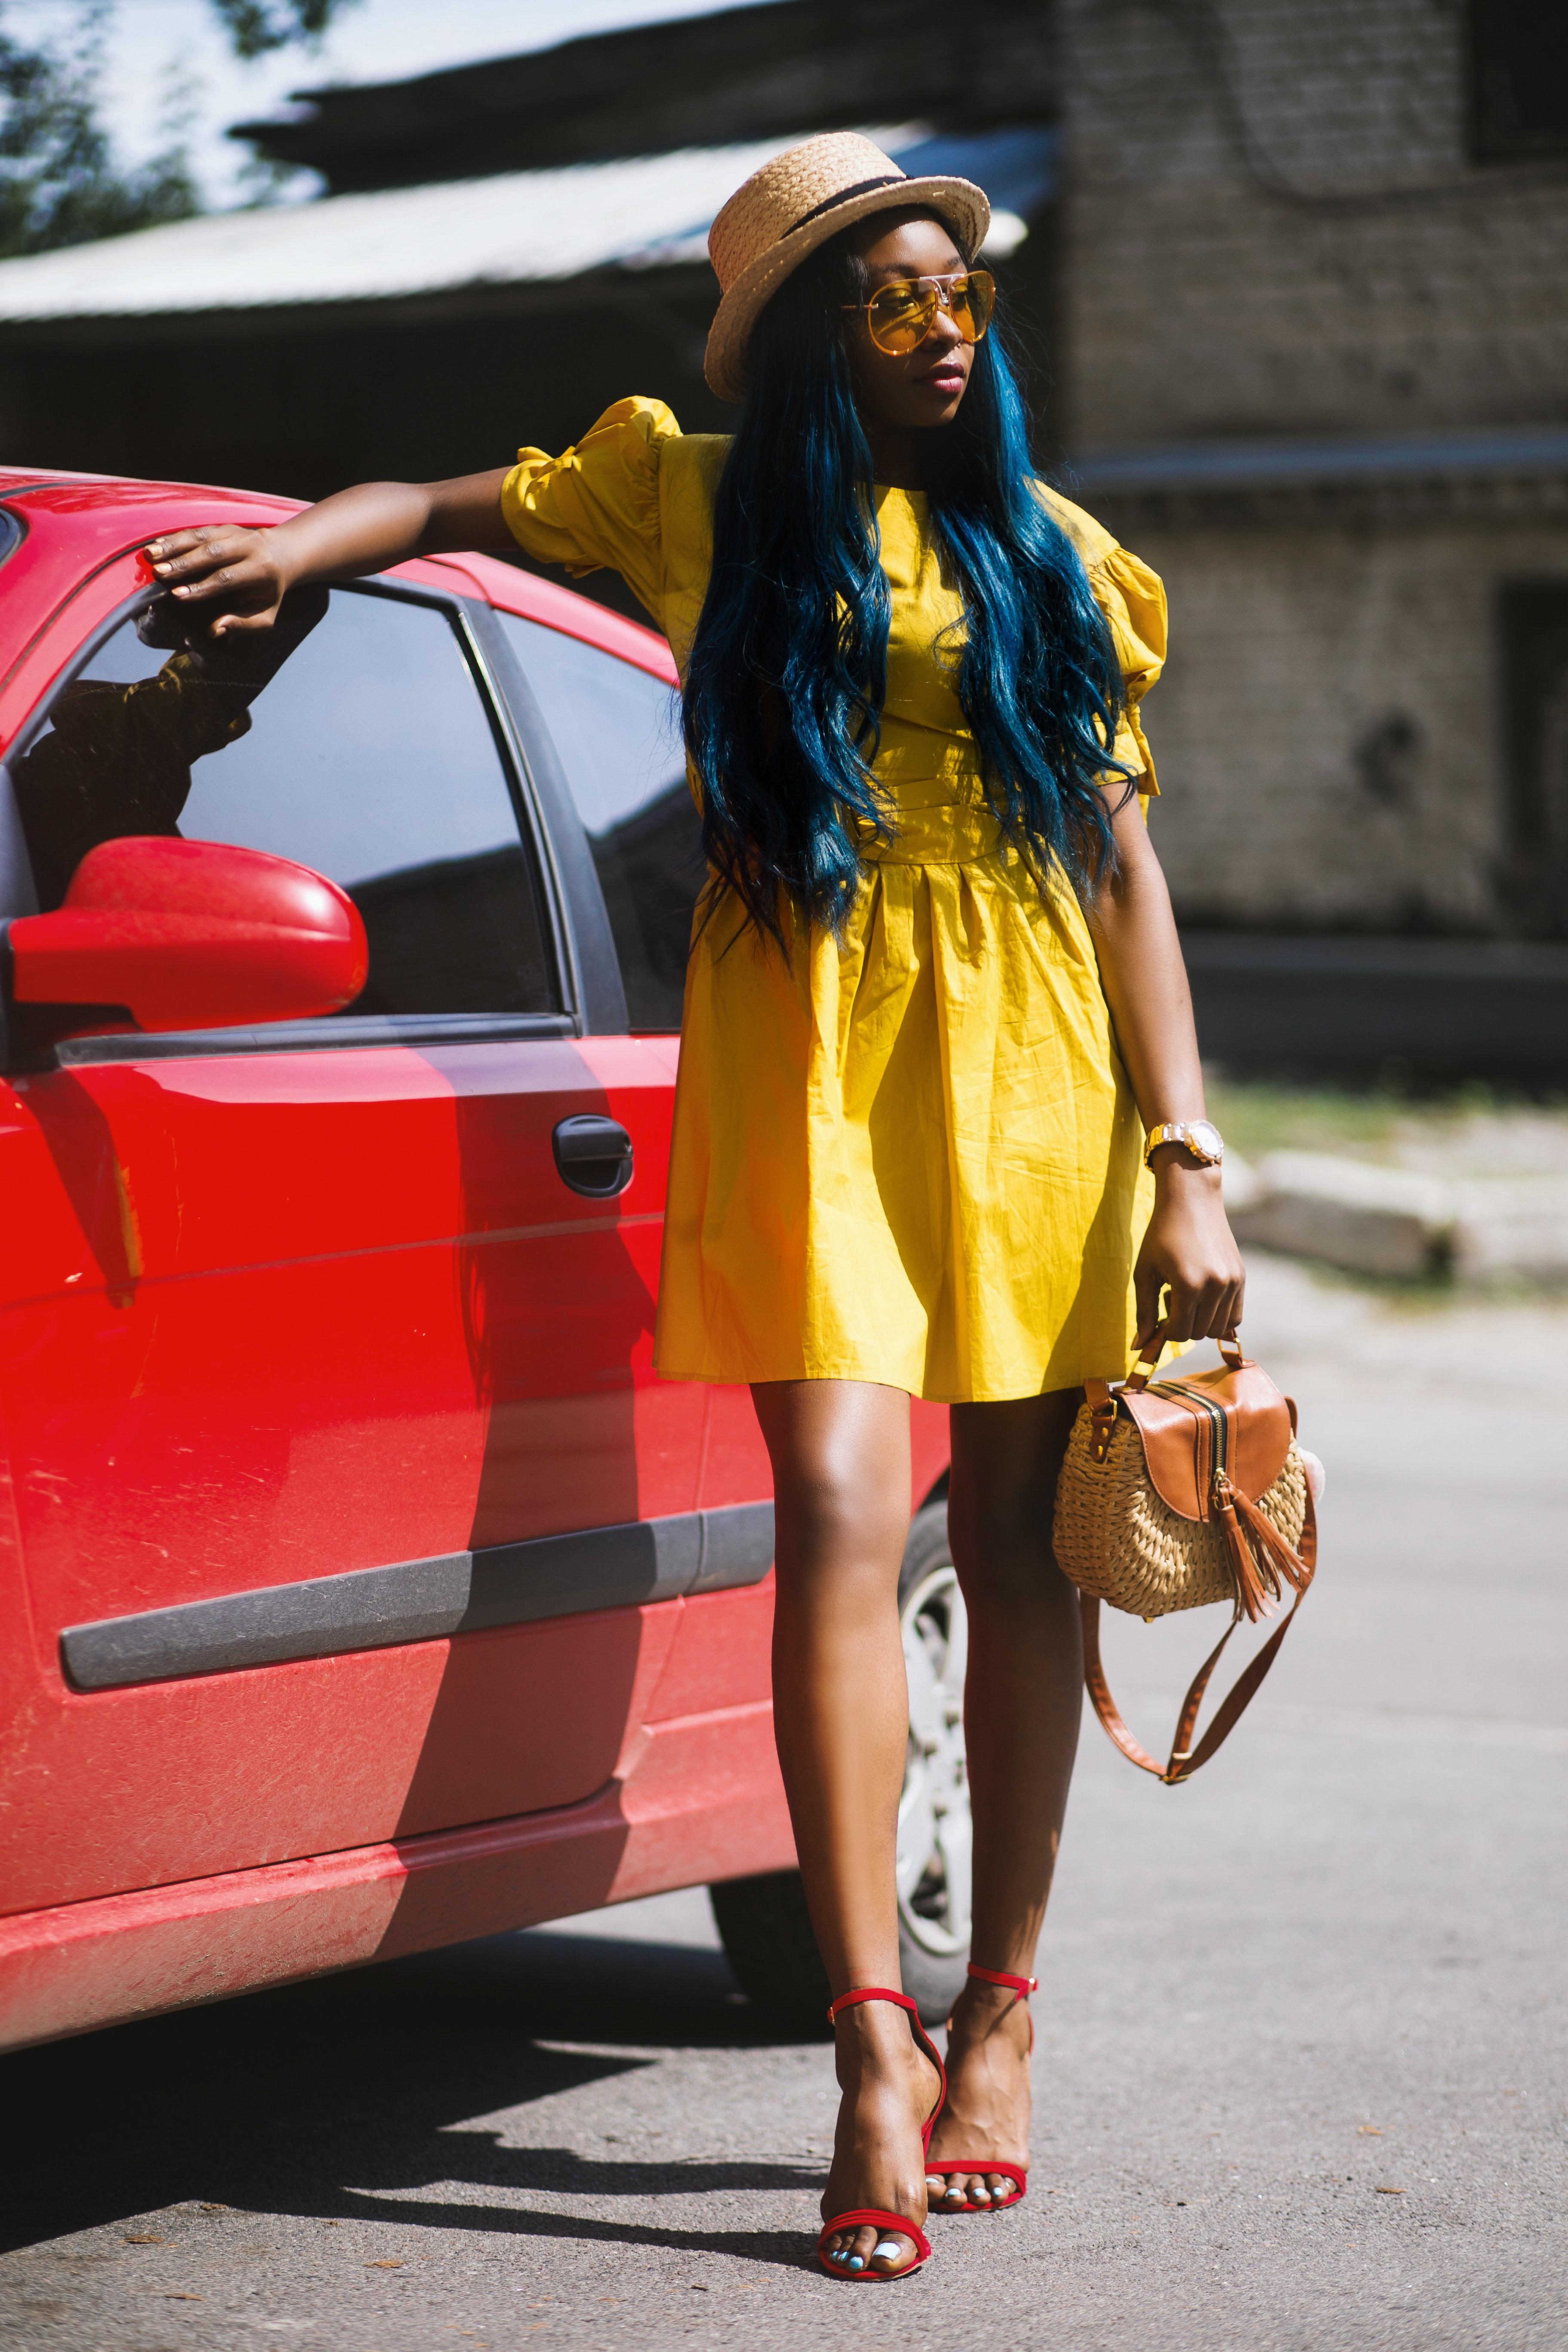 fa7c4cf2e2f Woman in Yellow Mini Dress Holding Handbag Beside Red Car. Godisable Jacob